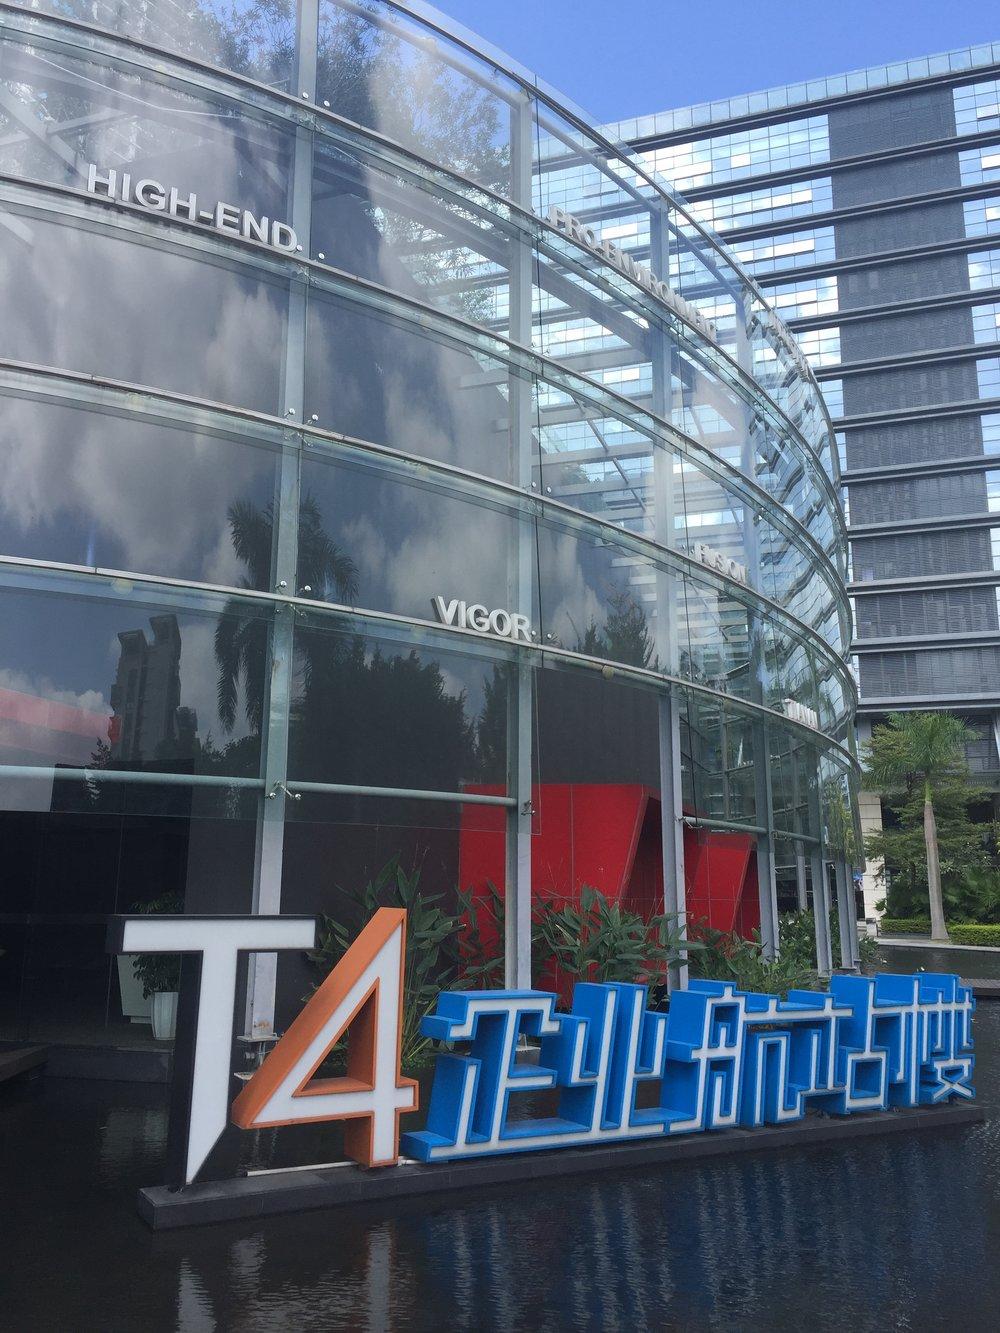 T4 is utopian live+work for innovators